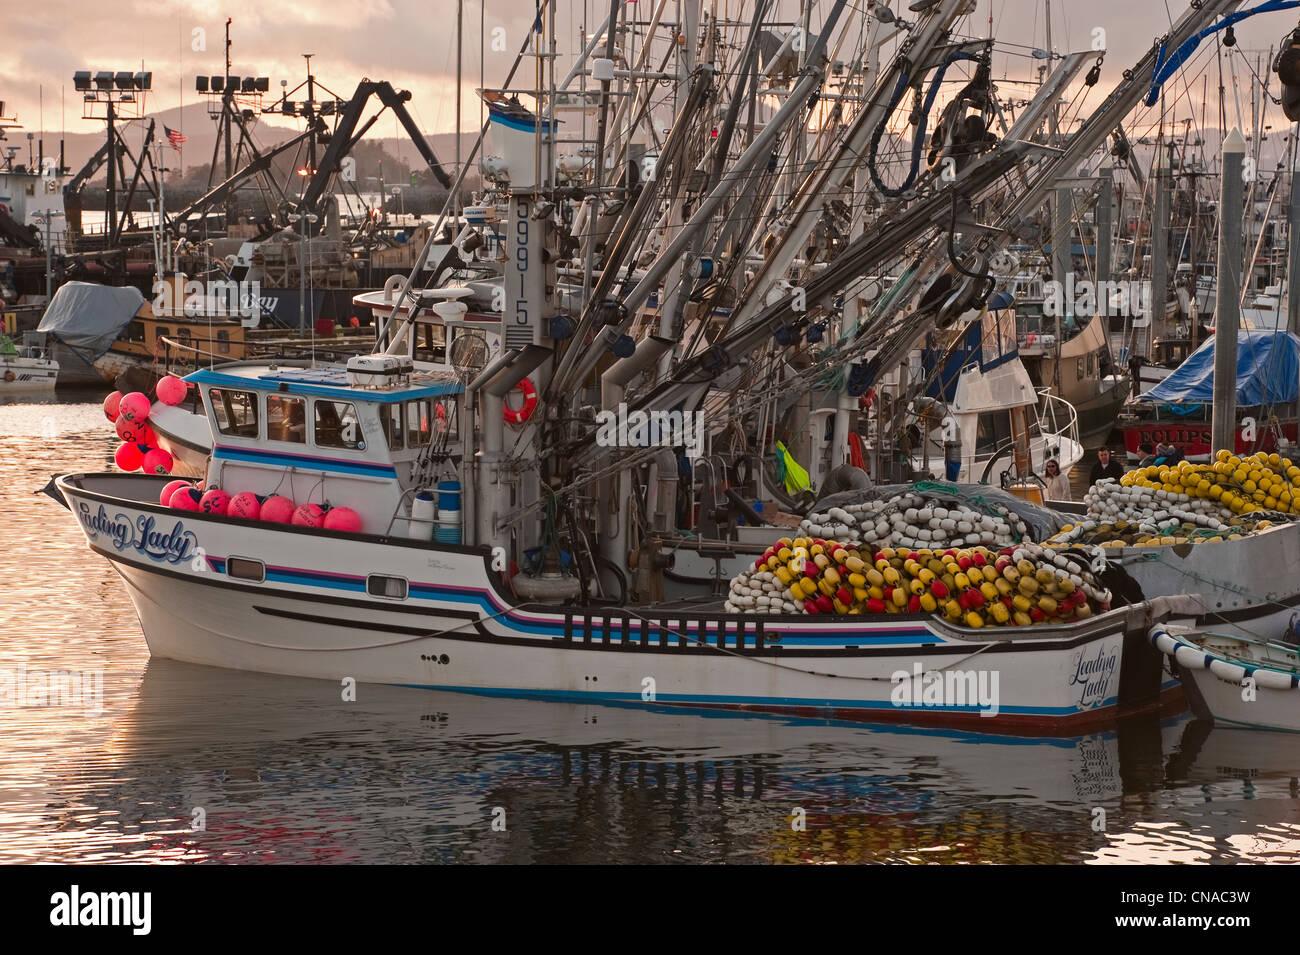 Sac huevas de arenque acoplado en la flota pesquera Thomsen Harbour en Sitka, Alaska, EE.UU. Imagen De Stock